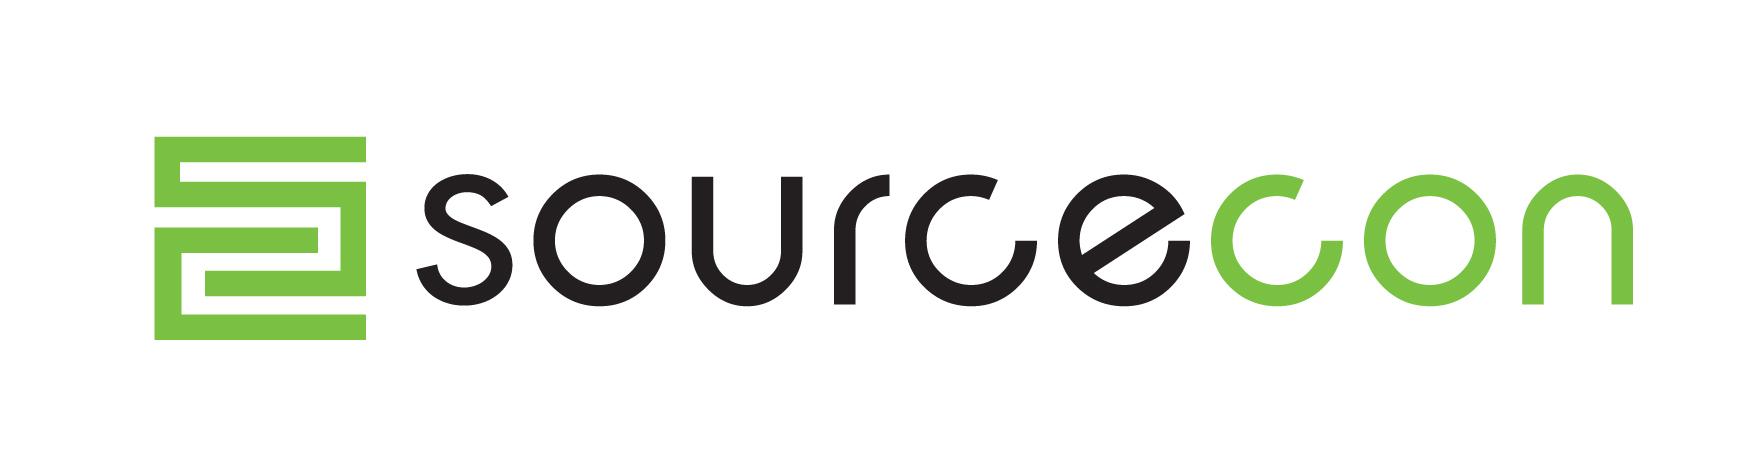 tumblr_static_sourcecon_logo_rgb_300dpi